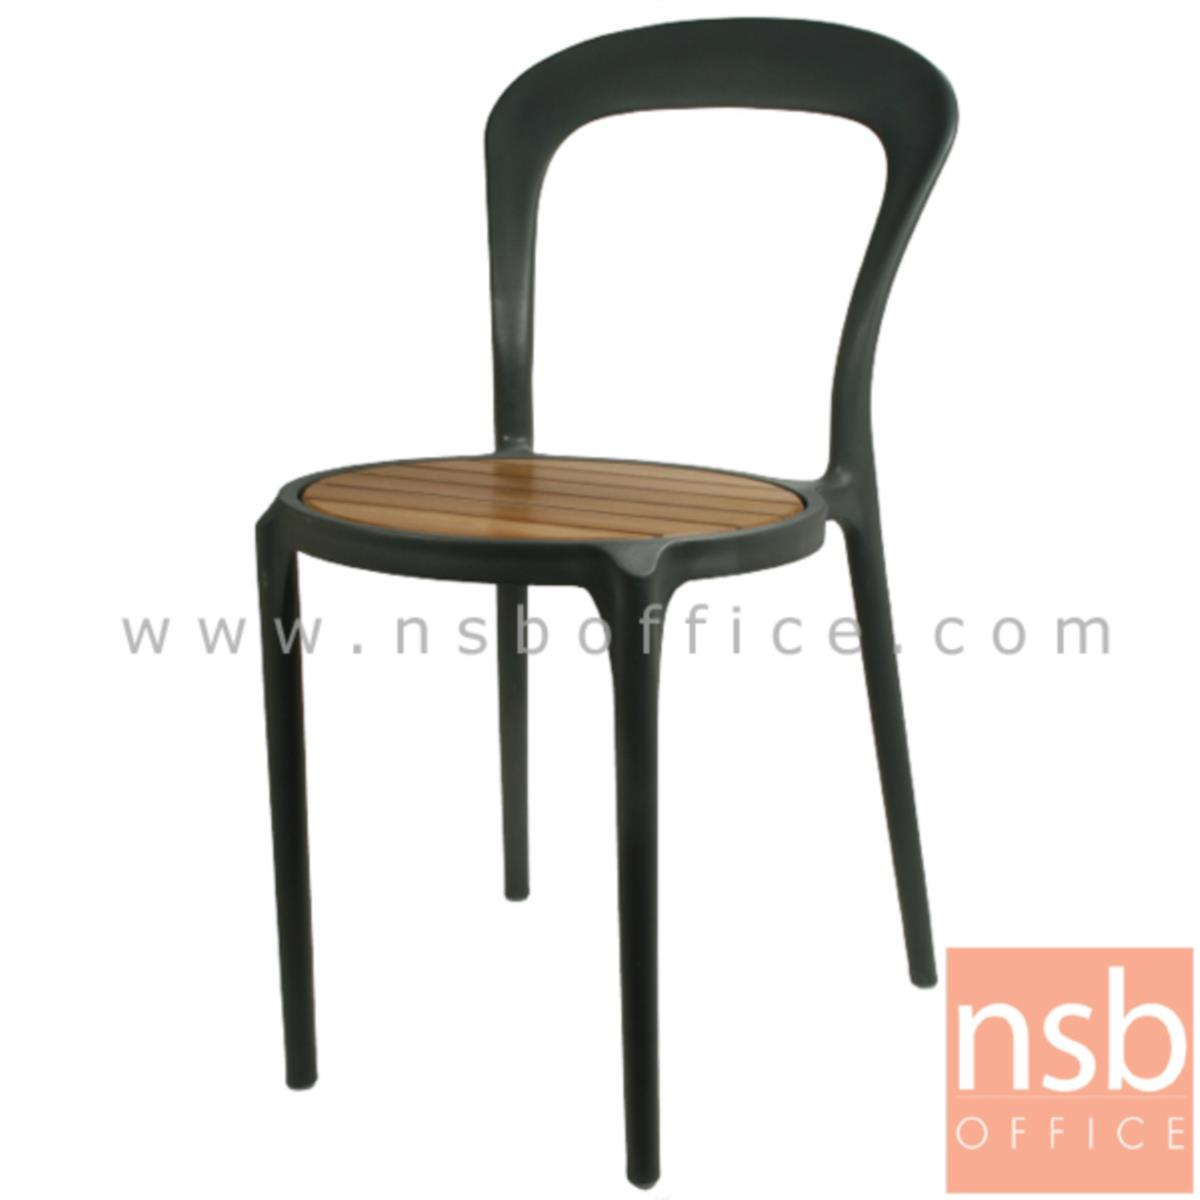 B29A073:เก้าอี้โมเดิร์นพลาสติกโพลี่(PP)ที่นั่งไม้(LDPE) รุ่น PP9228/1 ขนาด 41.5W cm.